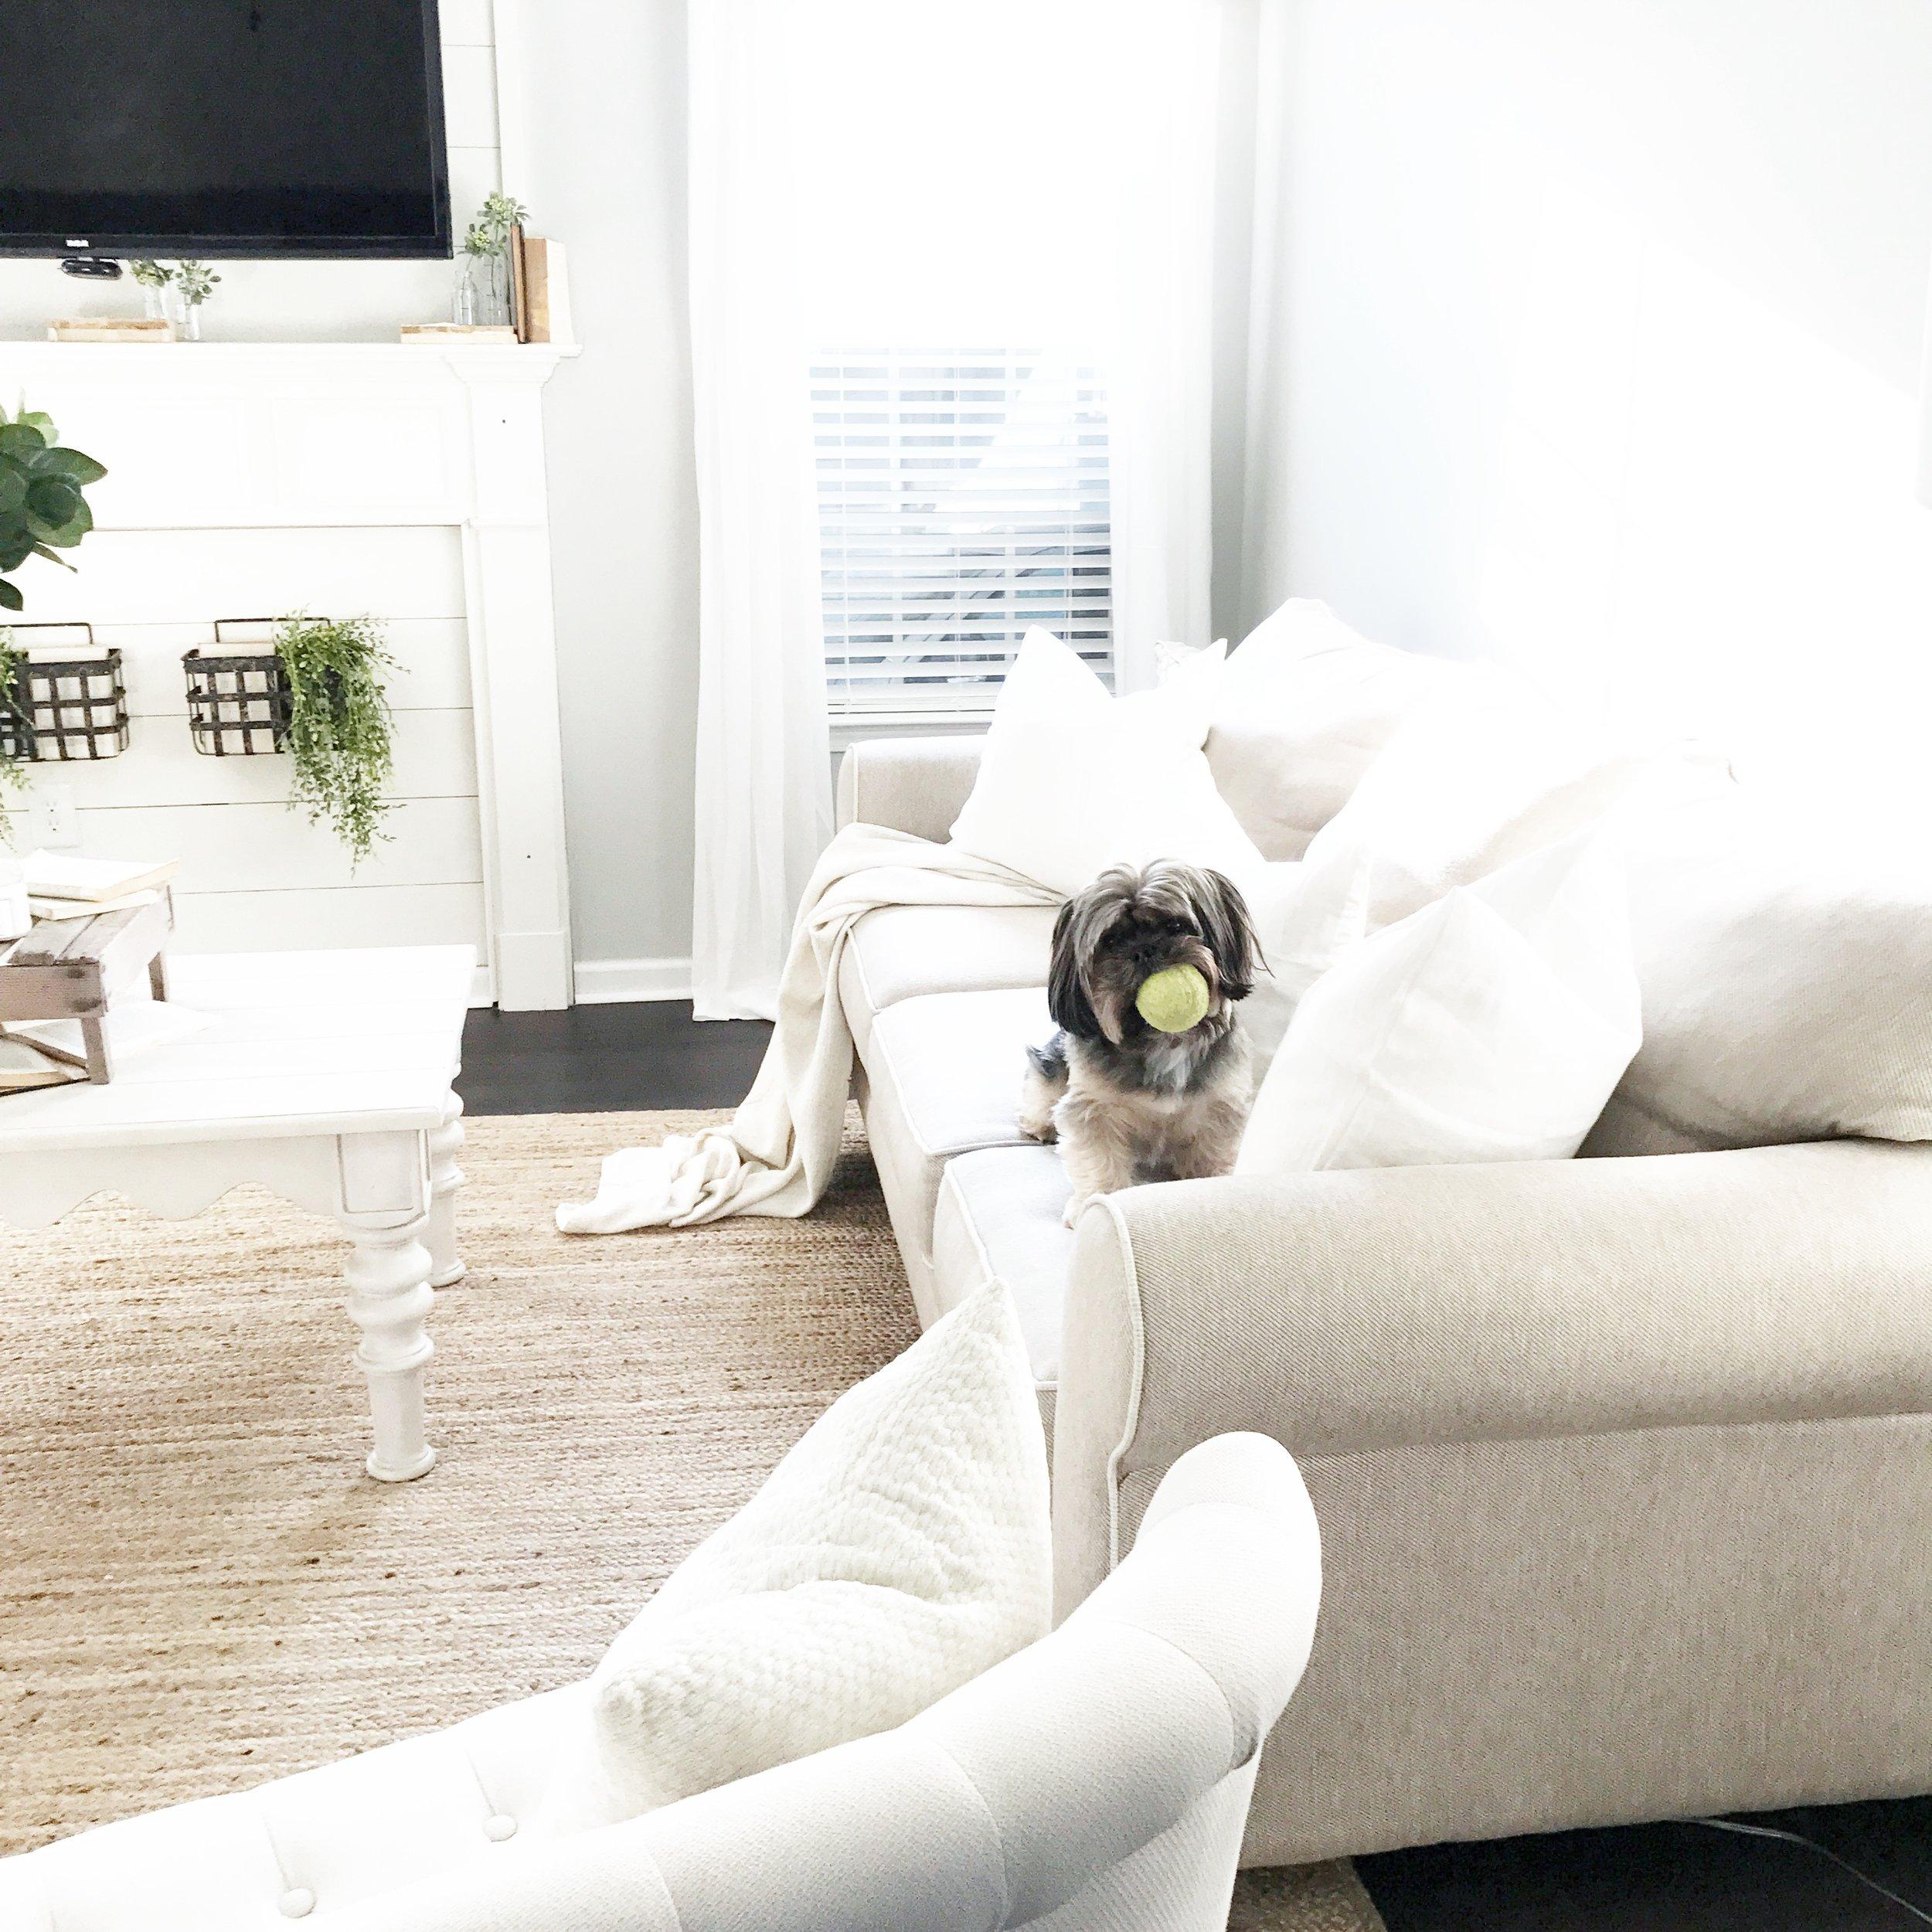 Farmhouse Style Living Room- Interior Design By Plum Pretty Decor and Design